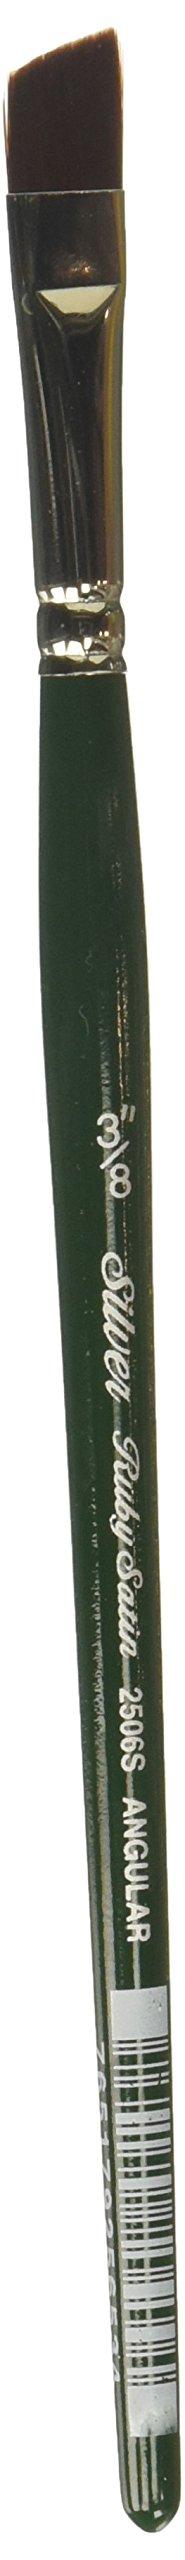 Silver Brush 2506S-038 Ruby Satin Short Handle Synthetic Brush, Angular, 3/8-Inch